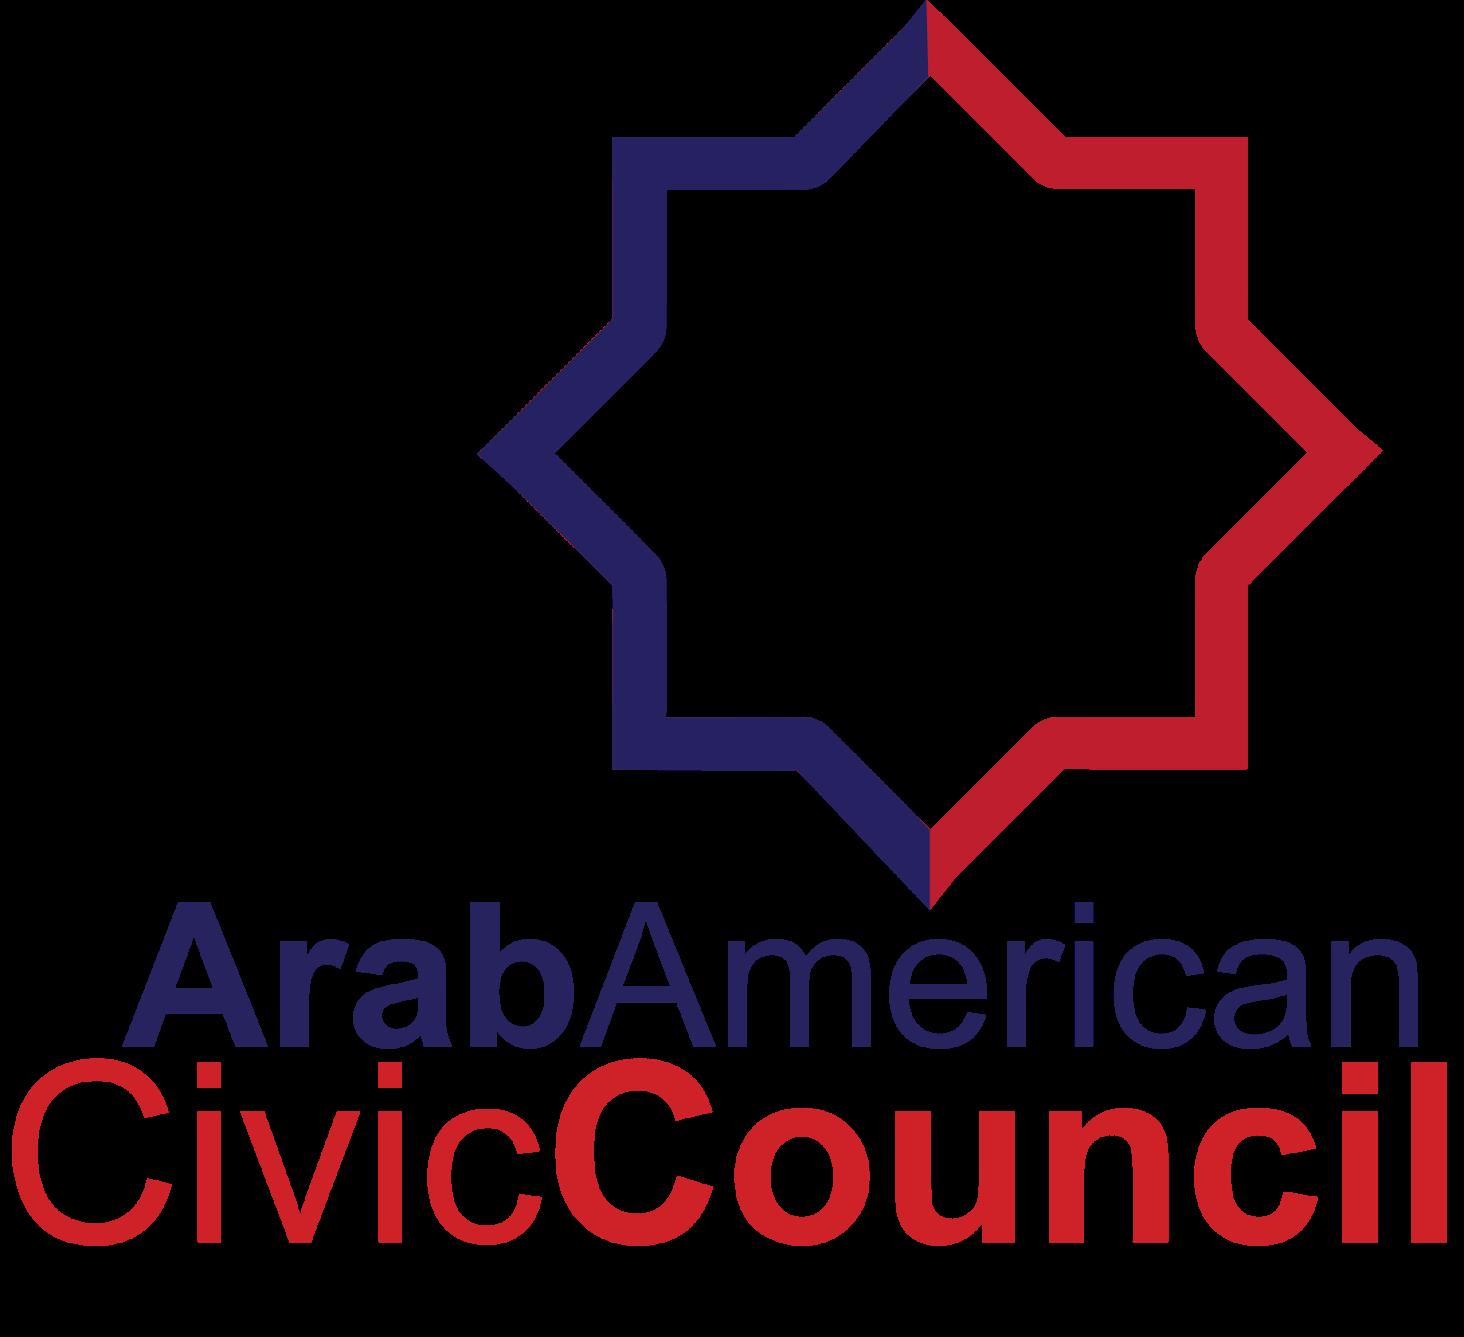 Arab American Civic Council